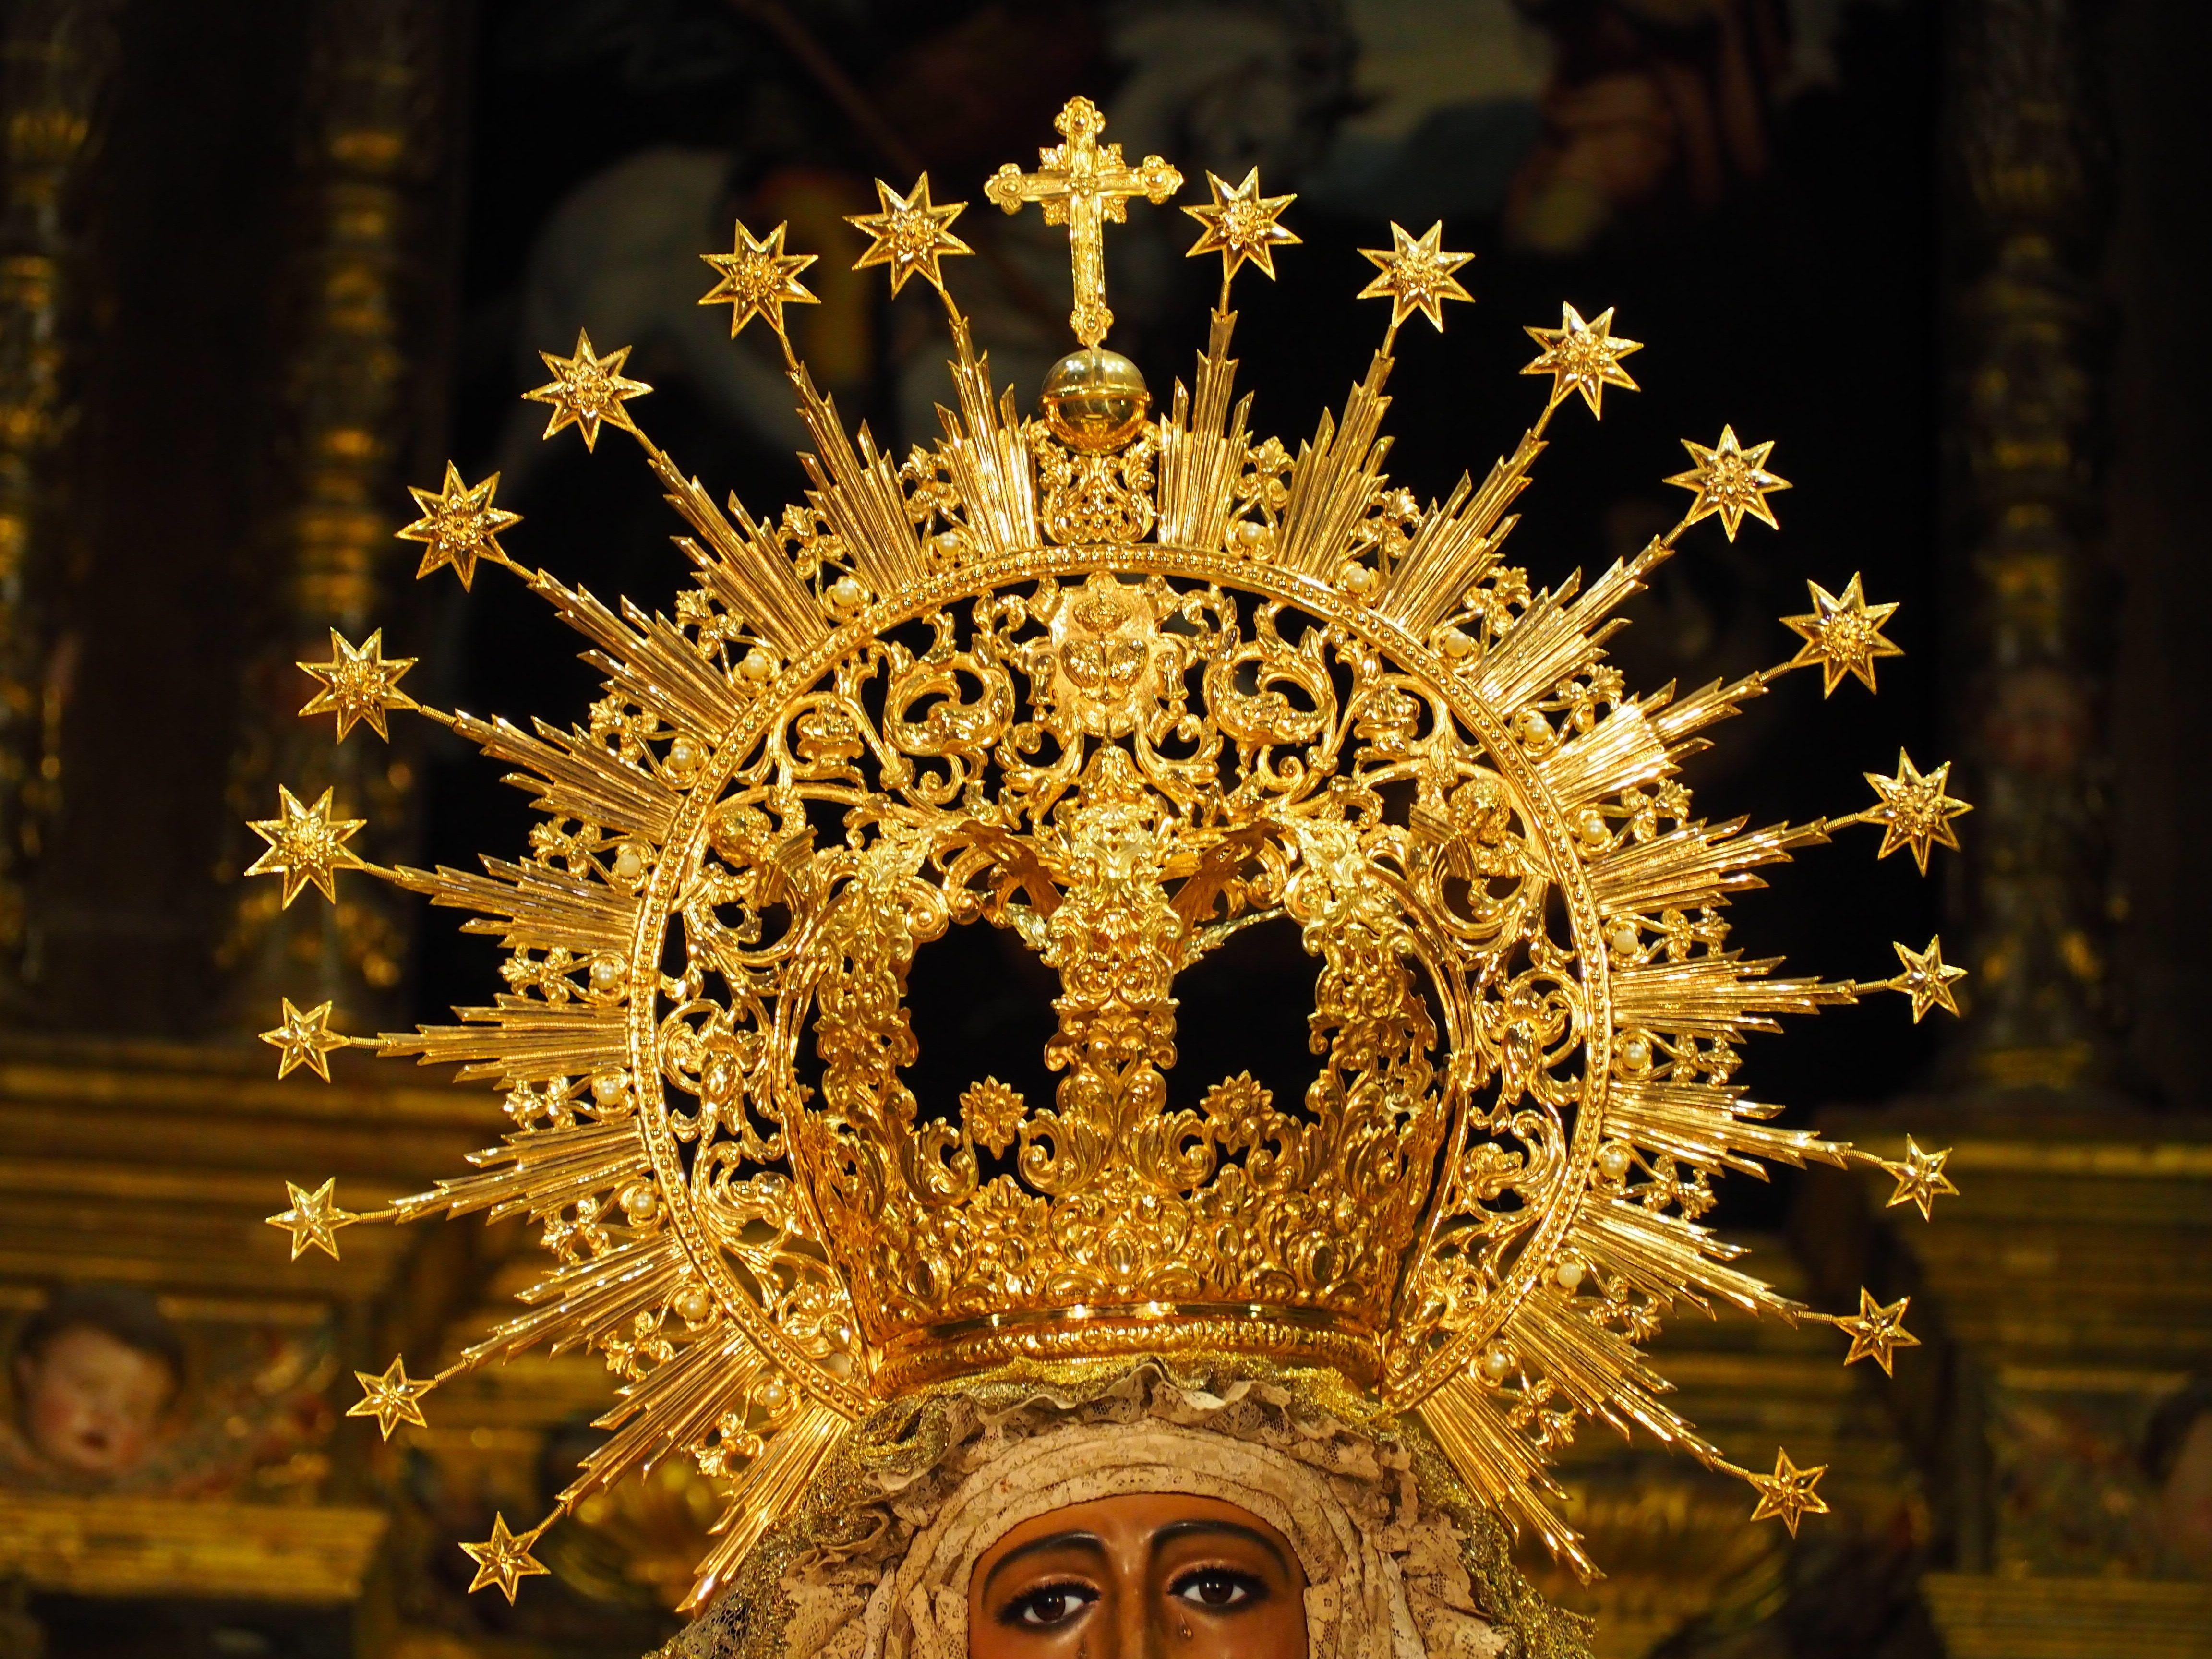 Virgen De La Esperanza Hermandad De La Esperanza De Triana Sevilla Coronas Semana Santa Sevilla